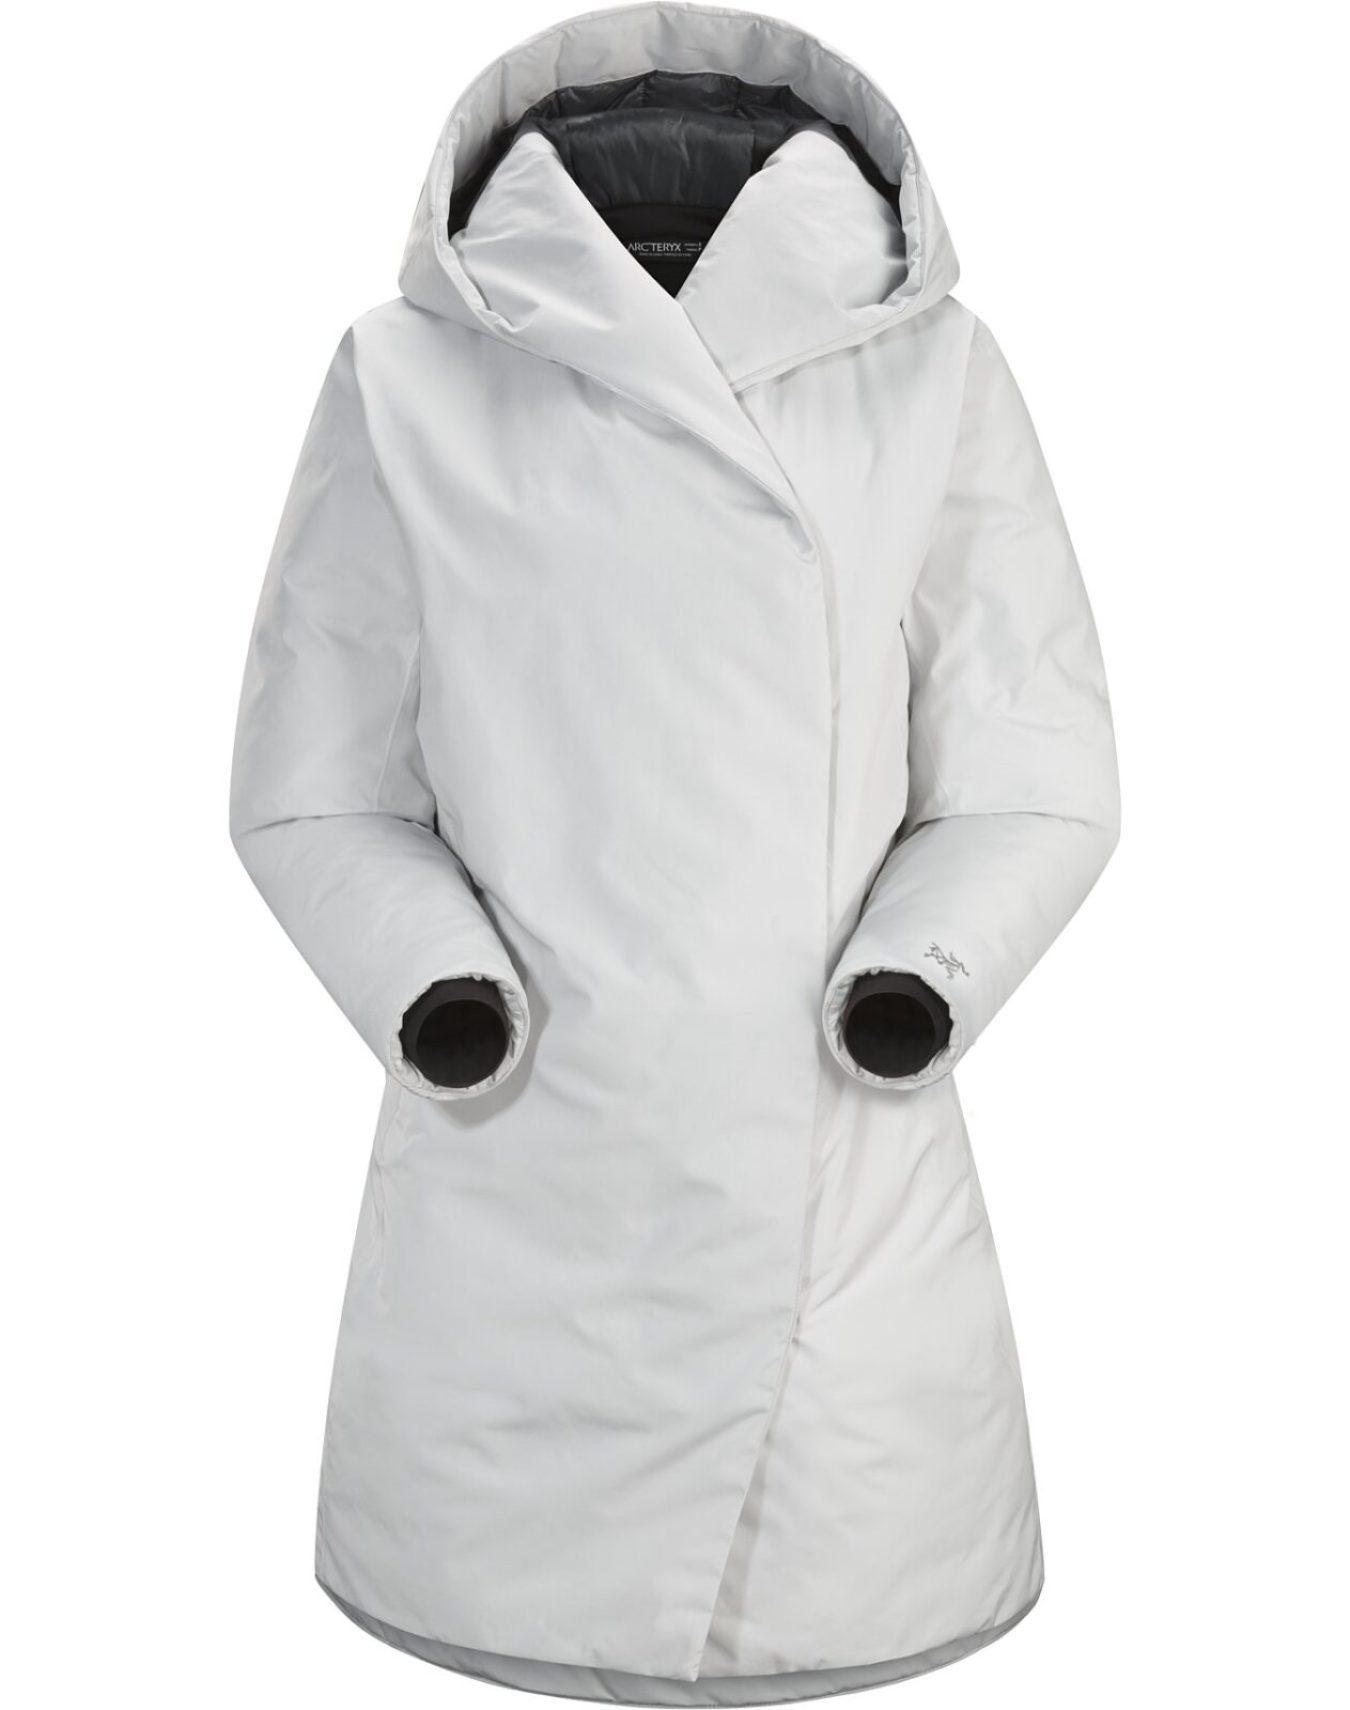 Arcteryx investment winter coat edit seven